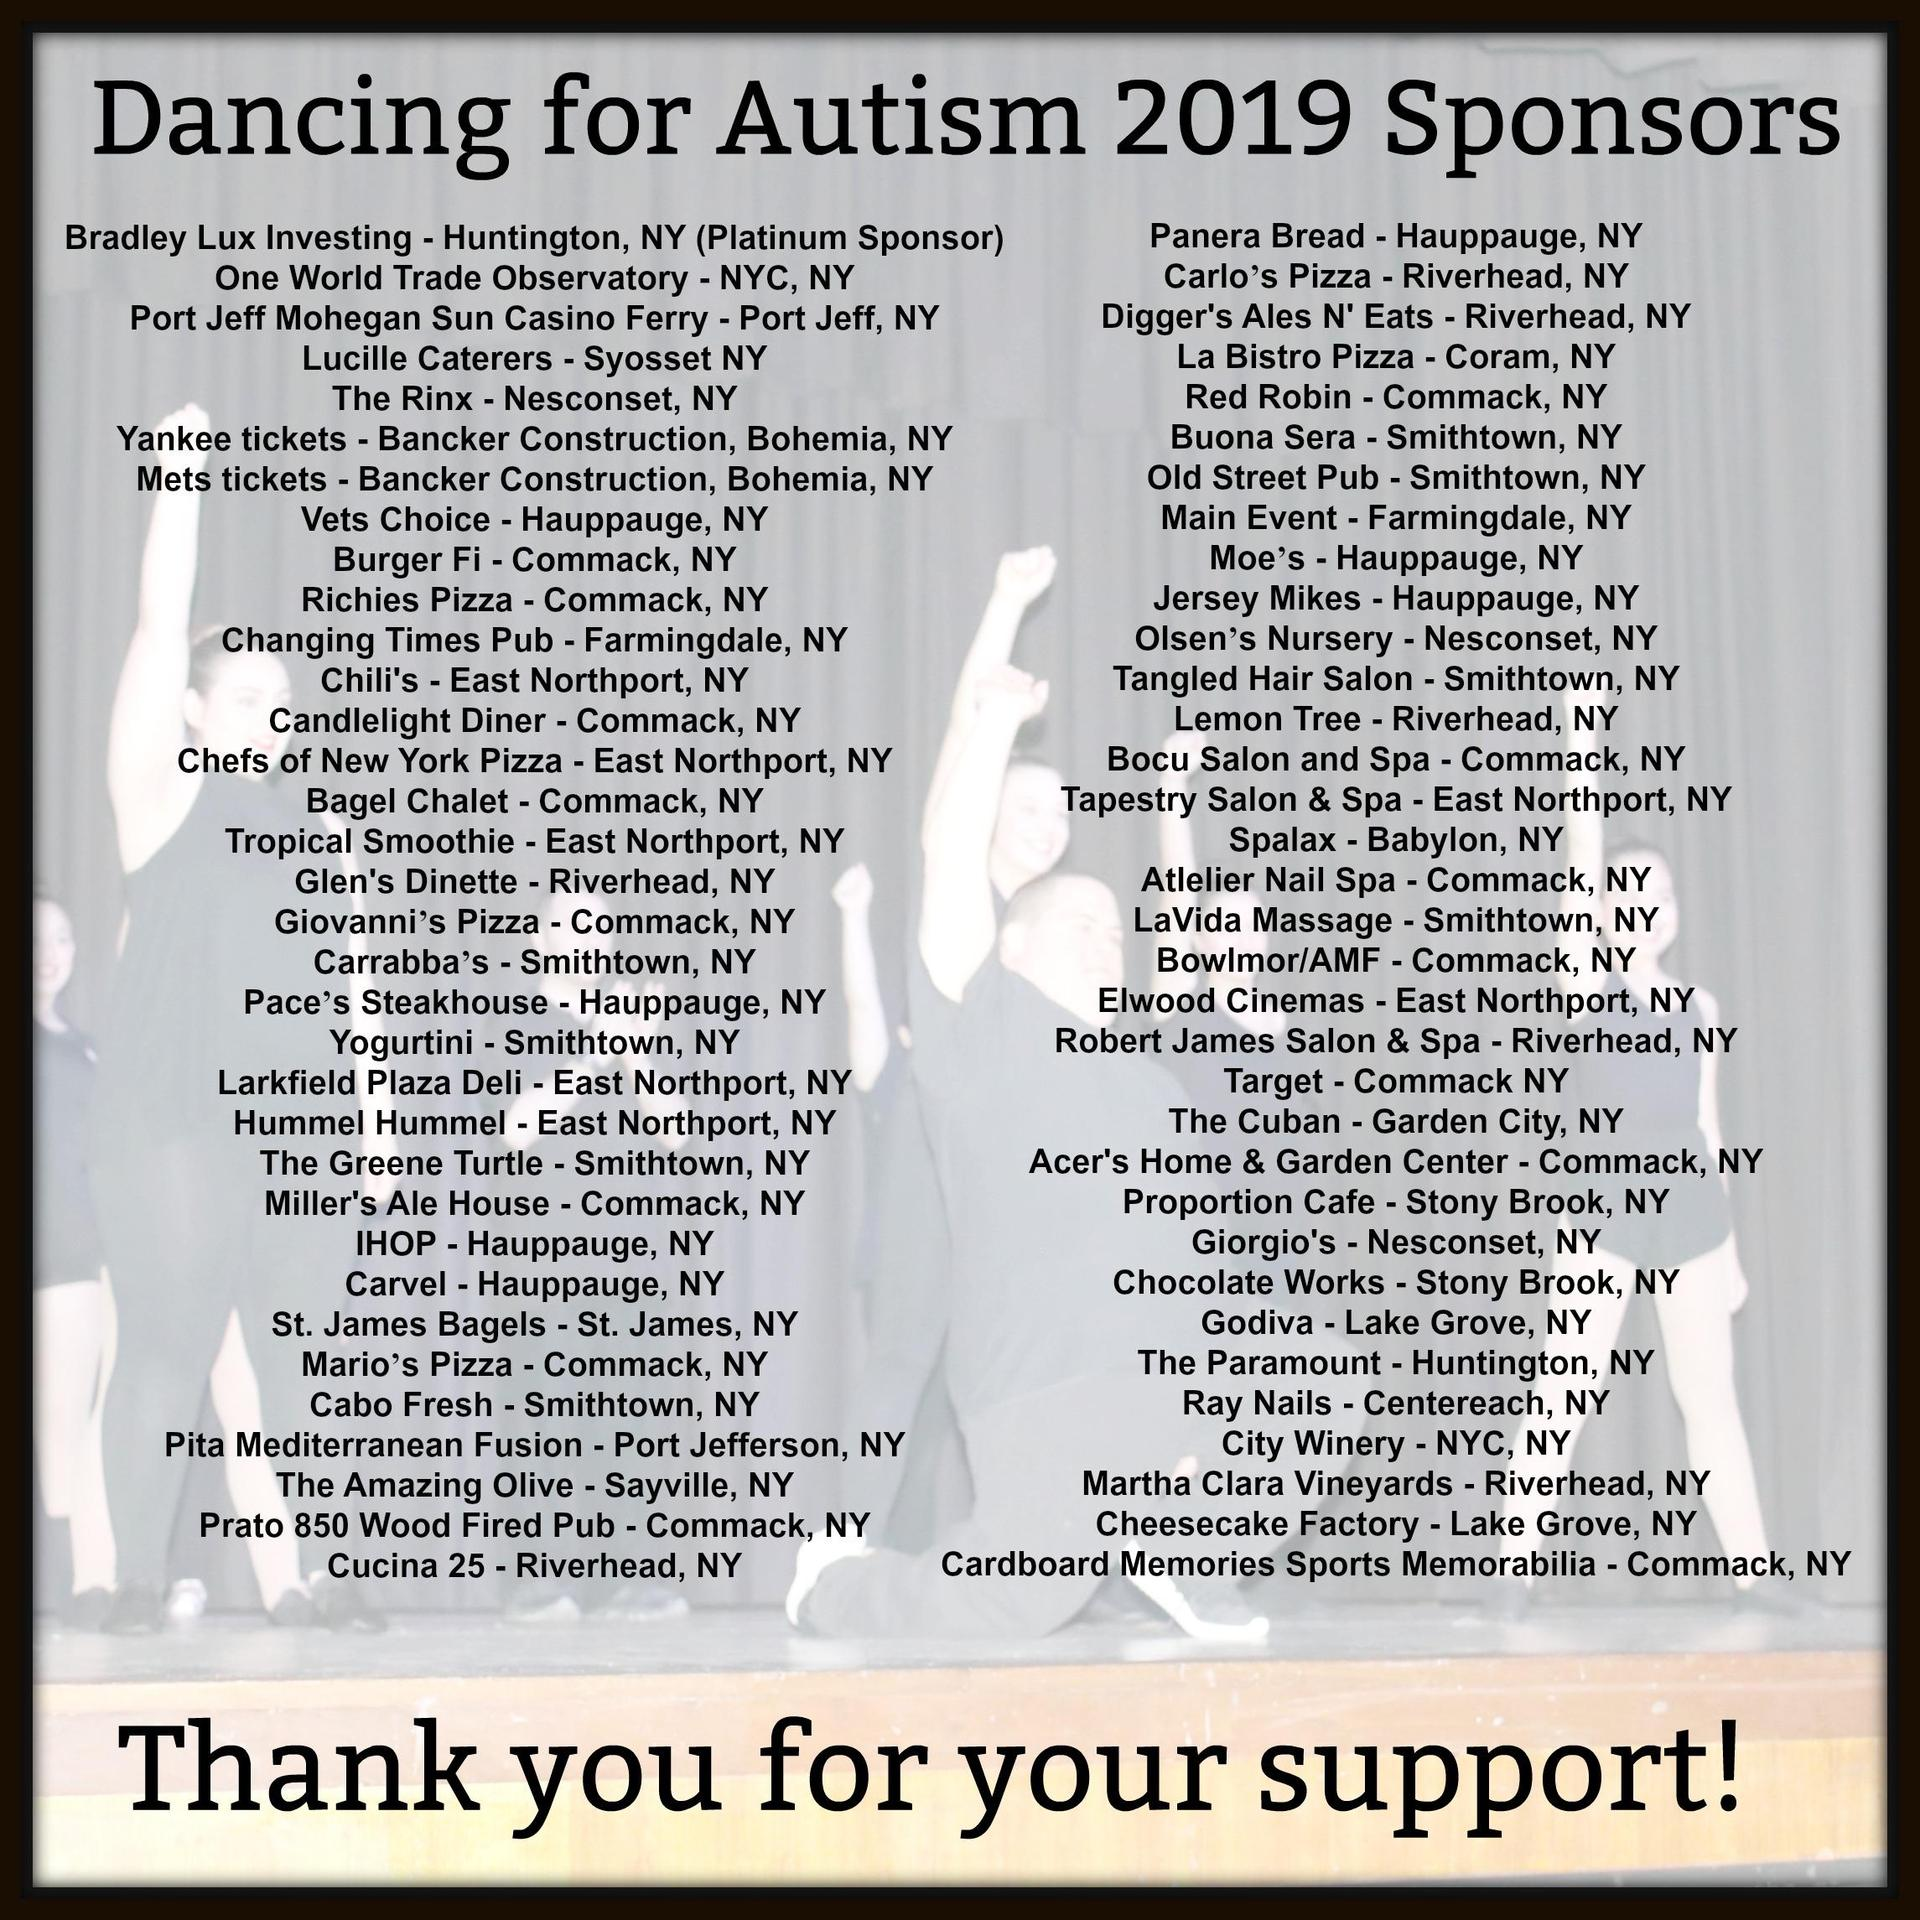 DFA sponsors